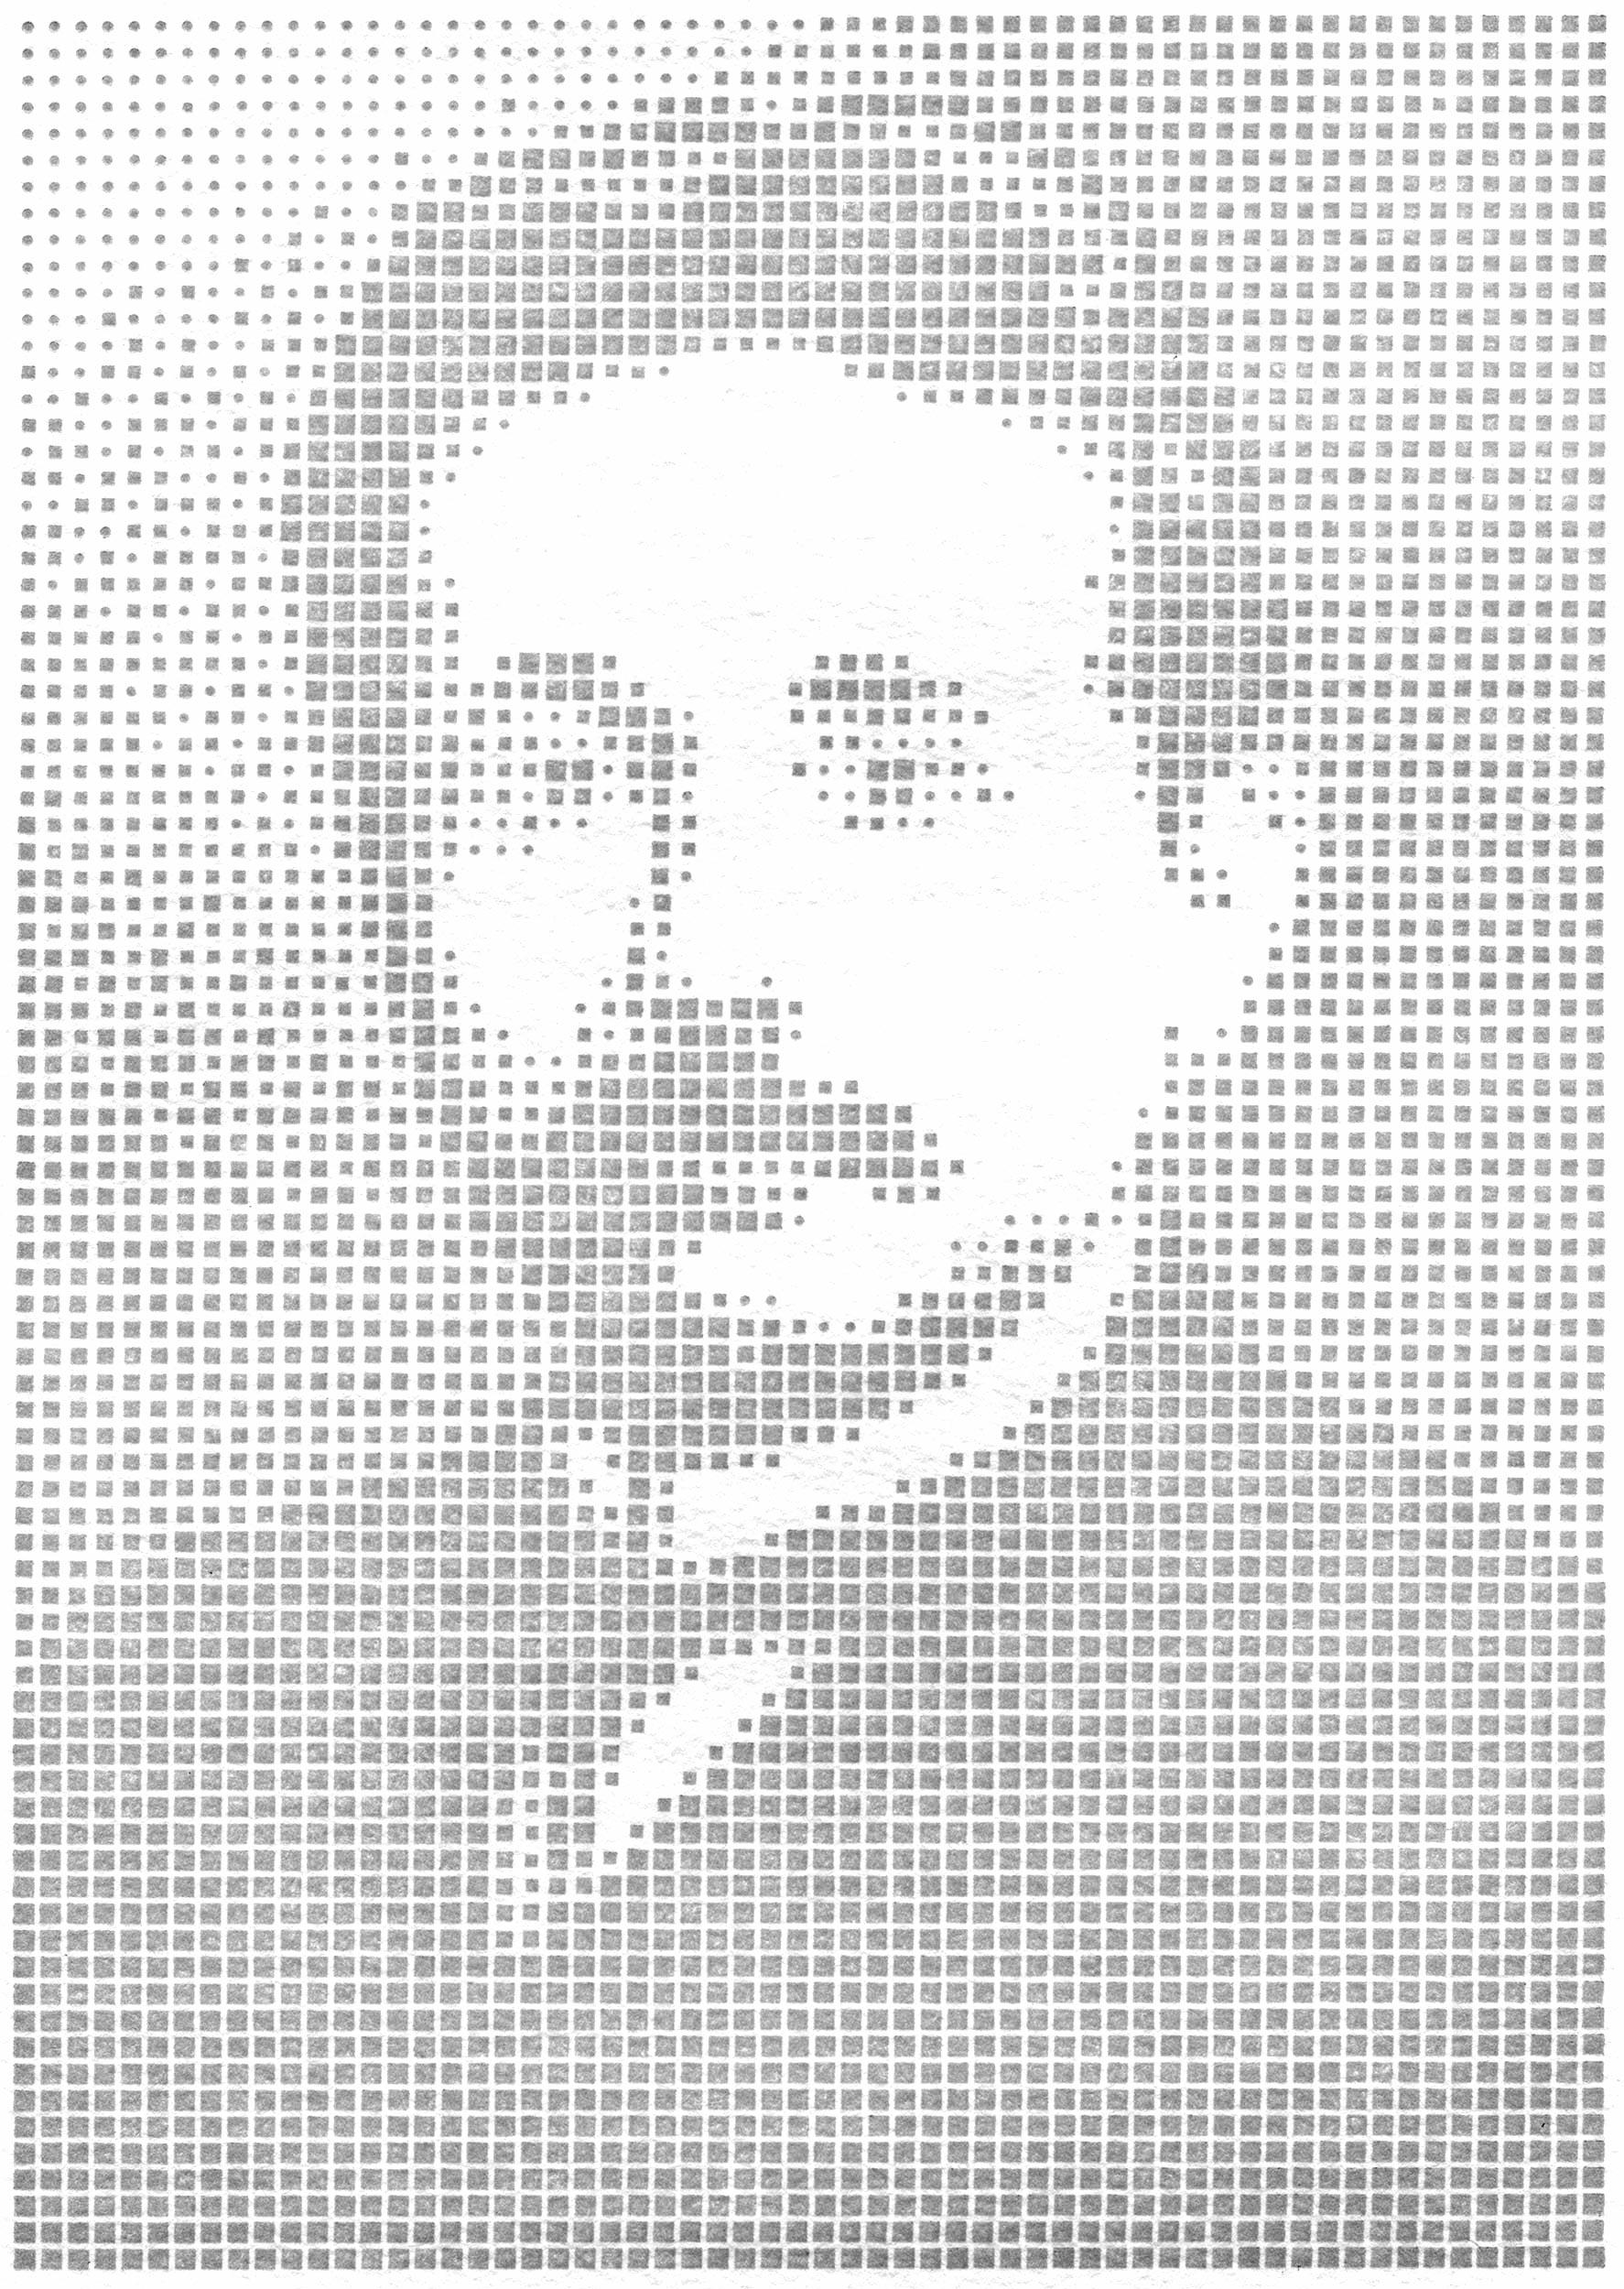 Portrait of Albert Einstein, handset in units of six-point metal type